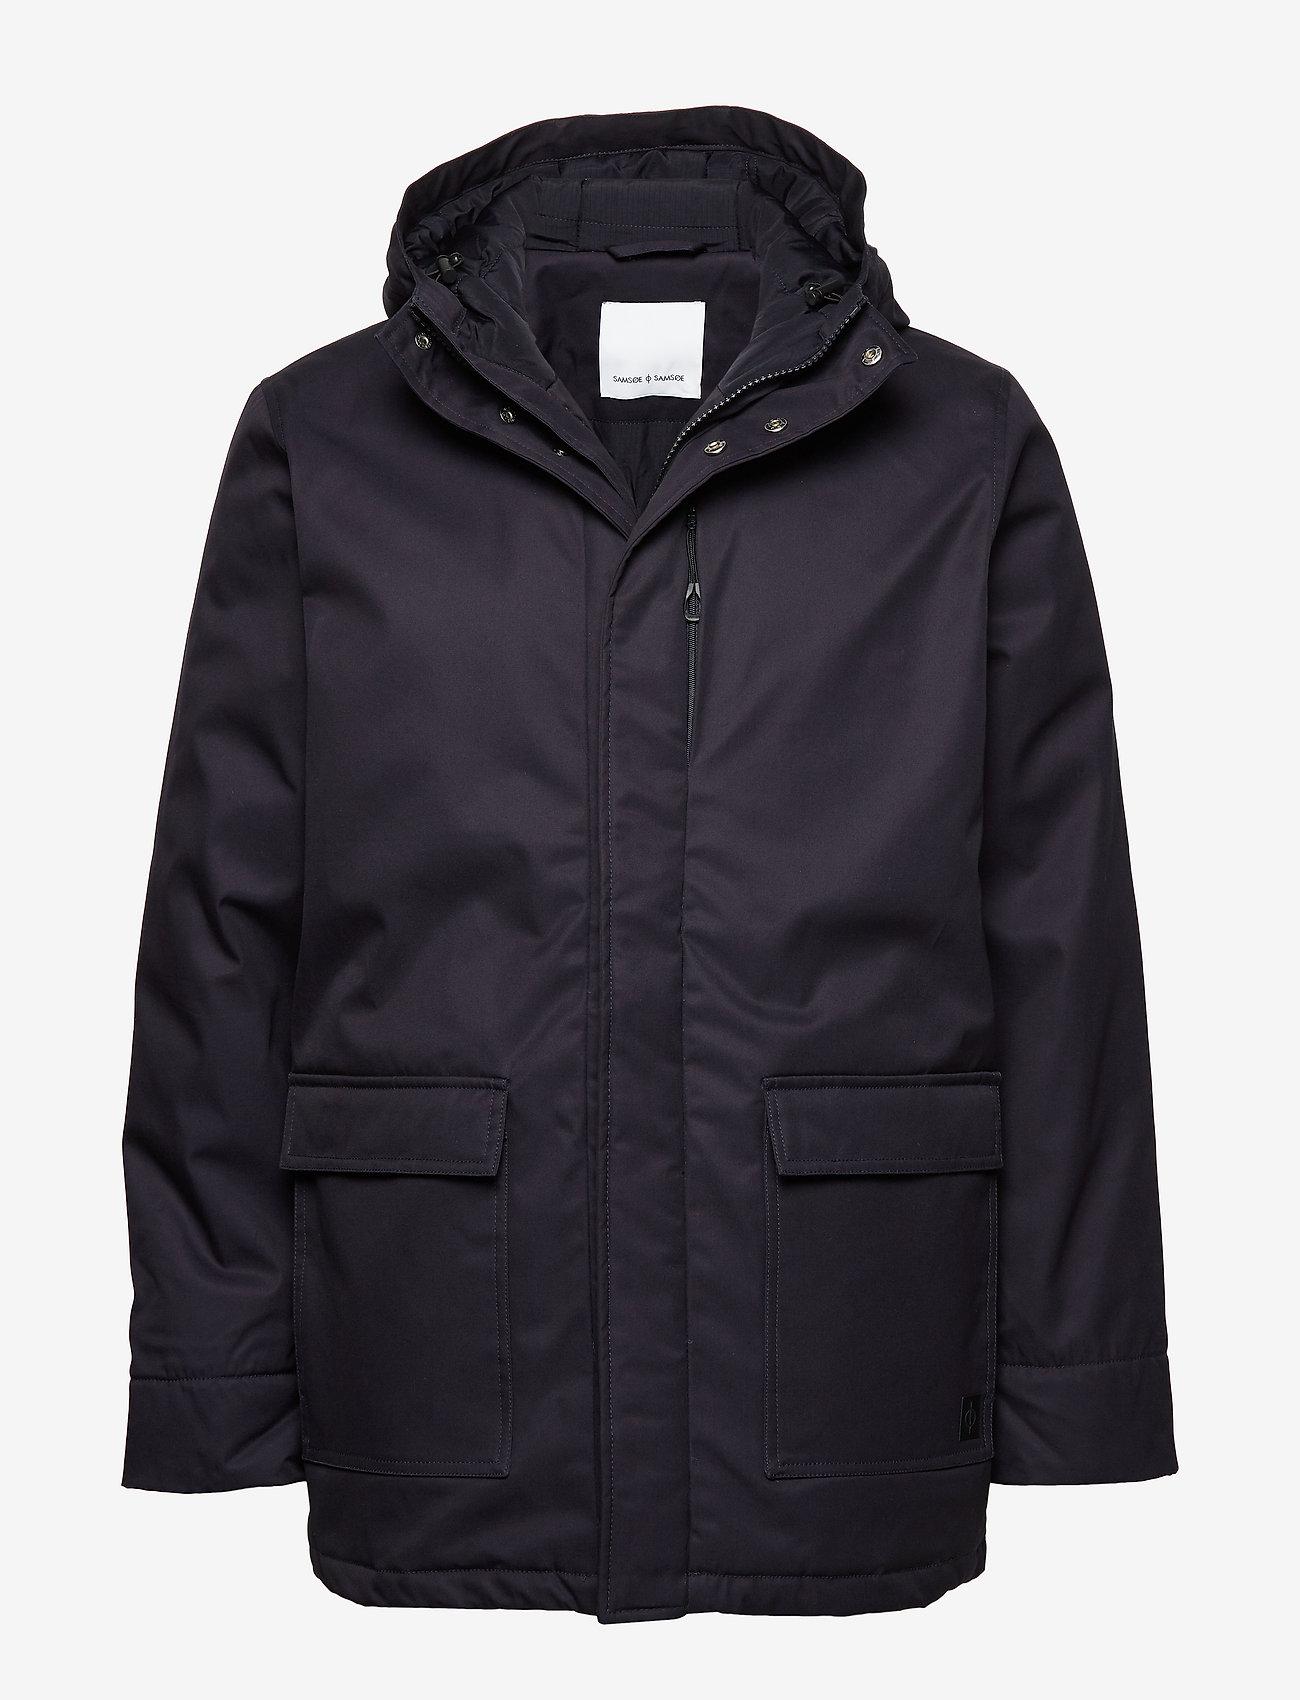 Samsøe Samsøe - Bel jacket 11183 - rainwear - night sky - 0